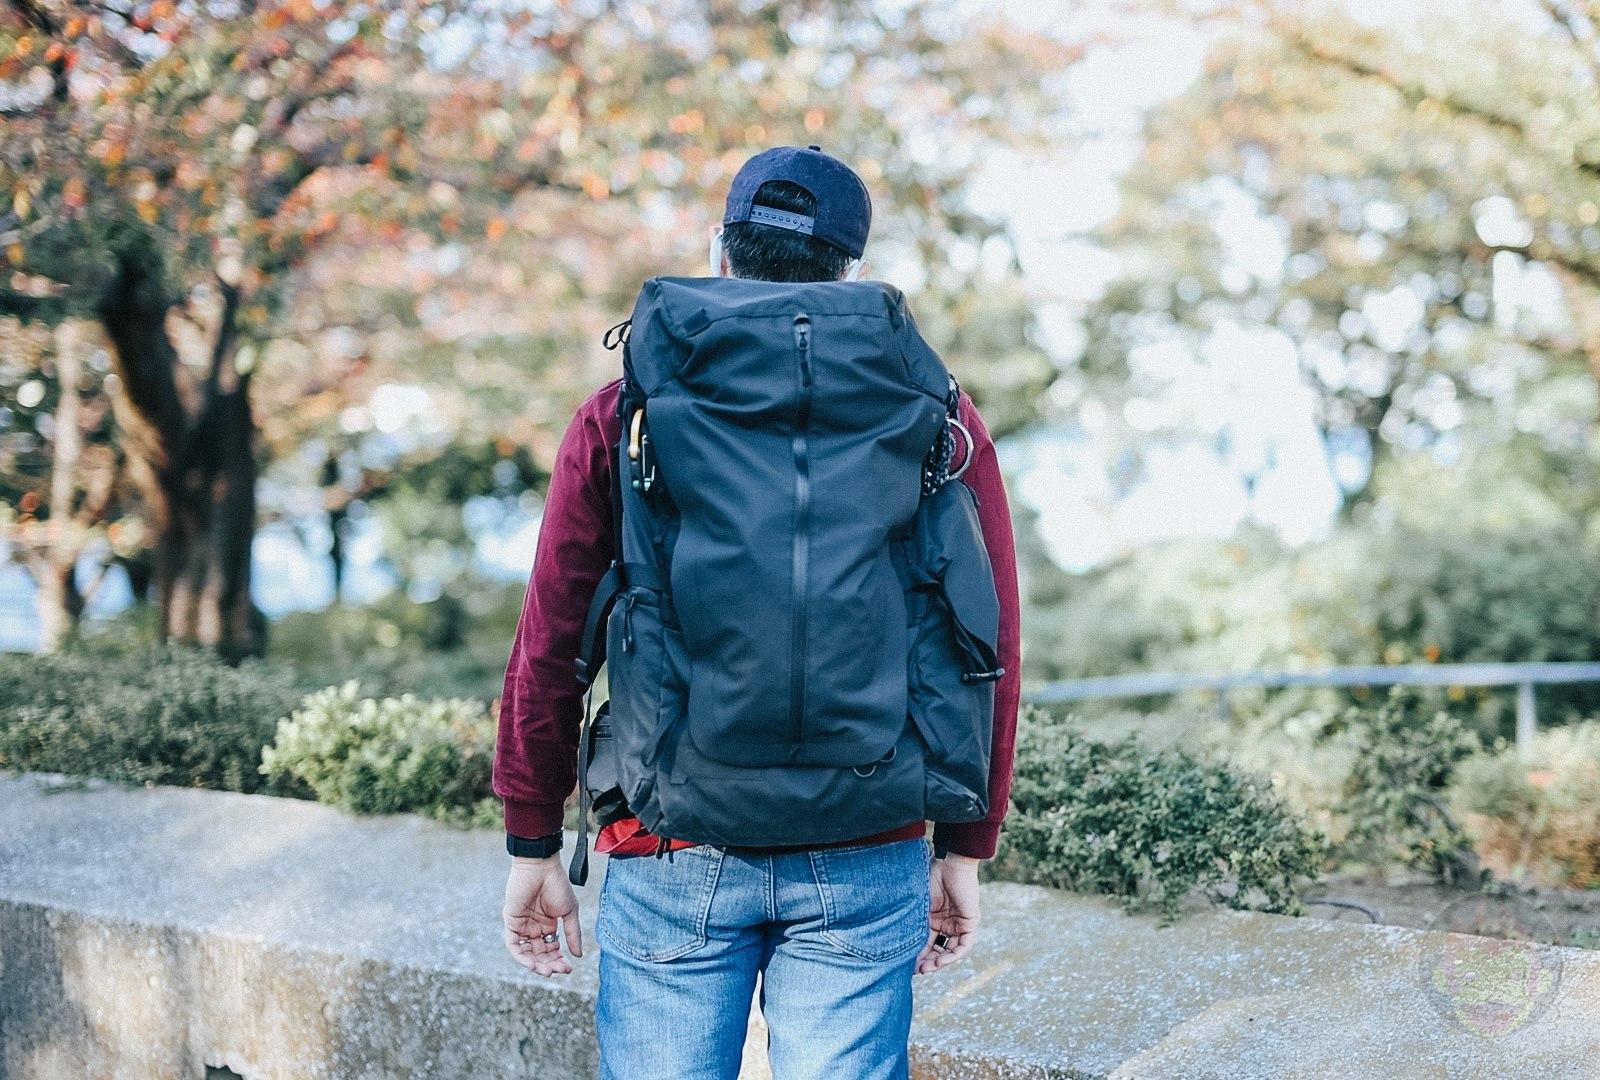 WANDRD FERNWEH Backpack Review 23